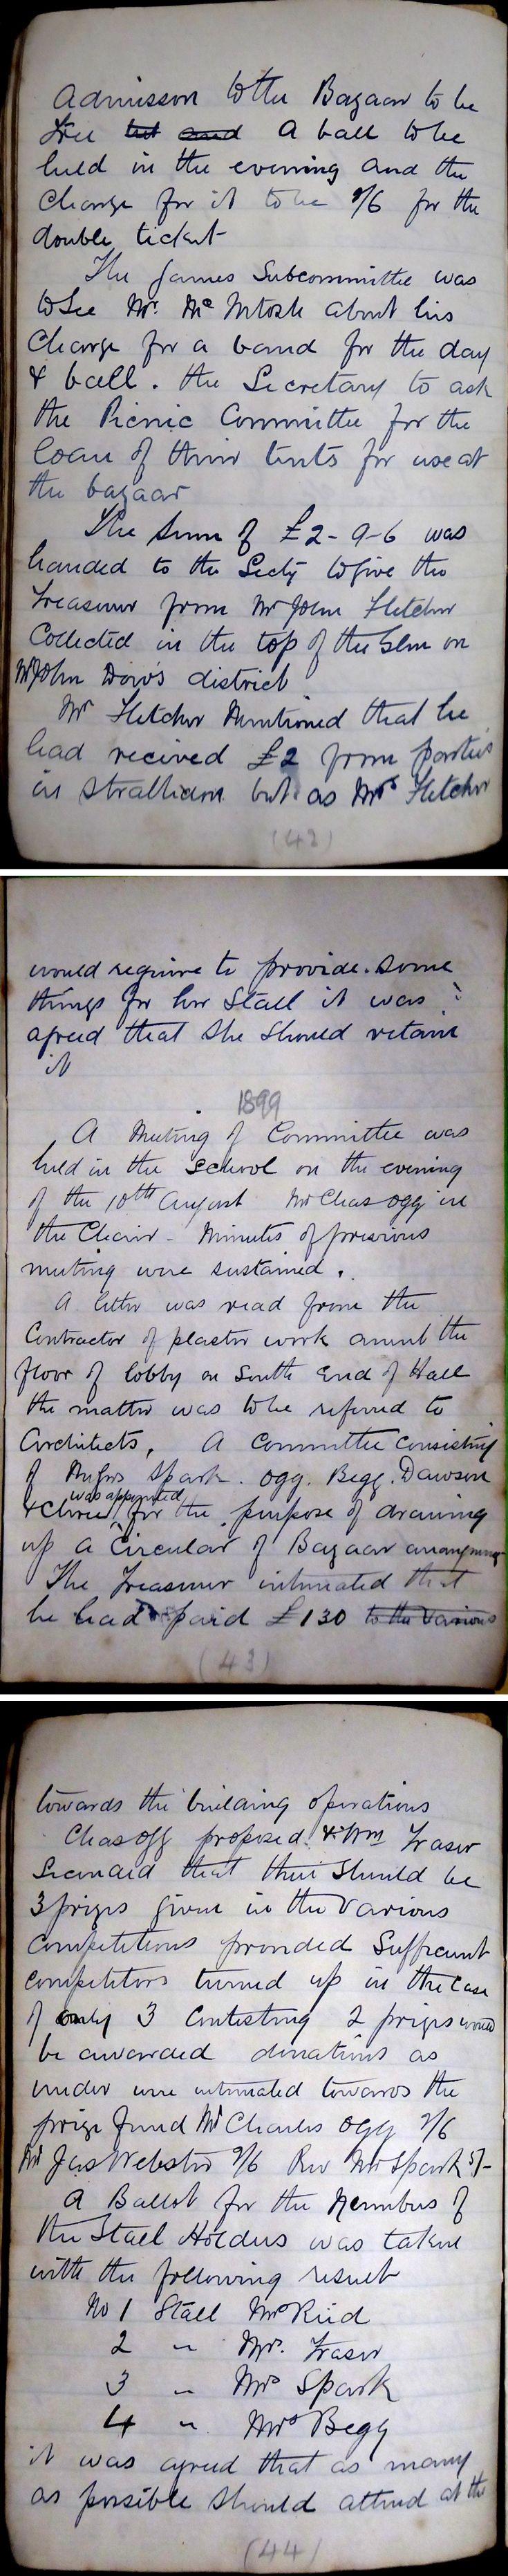 14 Glenbuchat Hall Committee Minutes